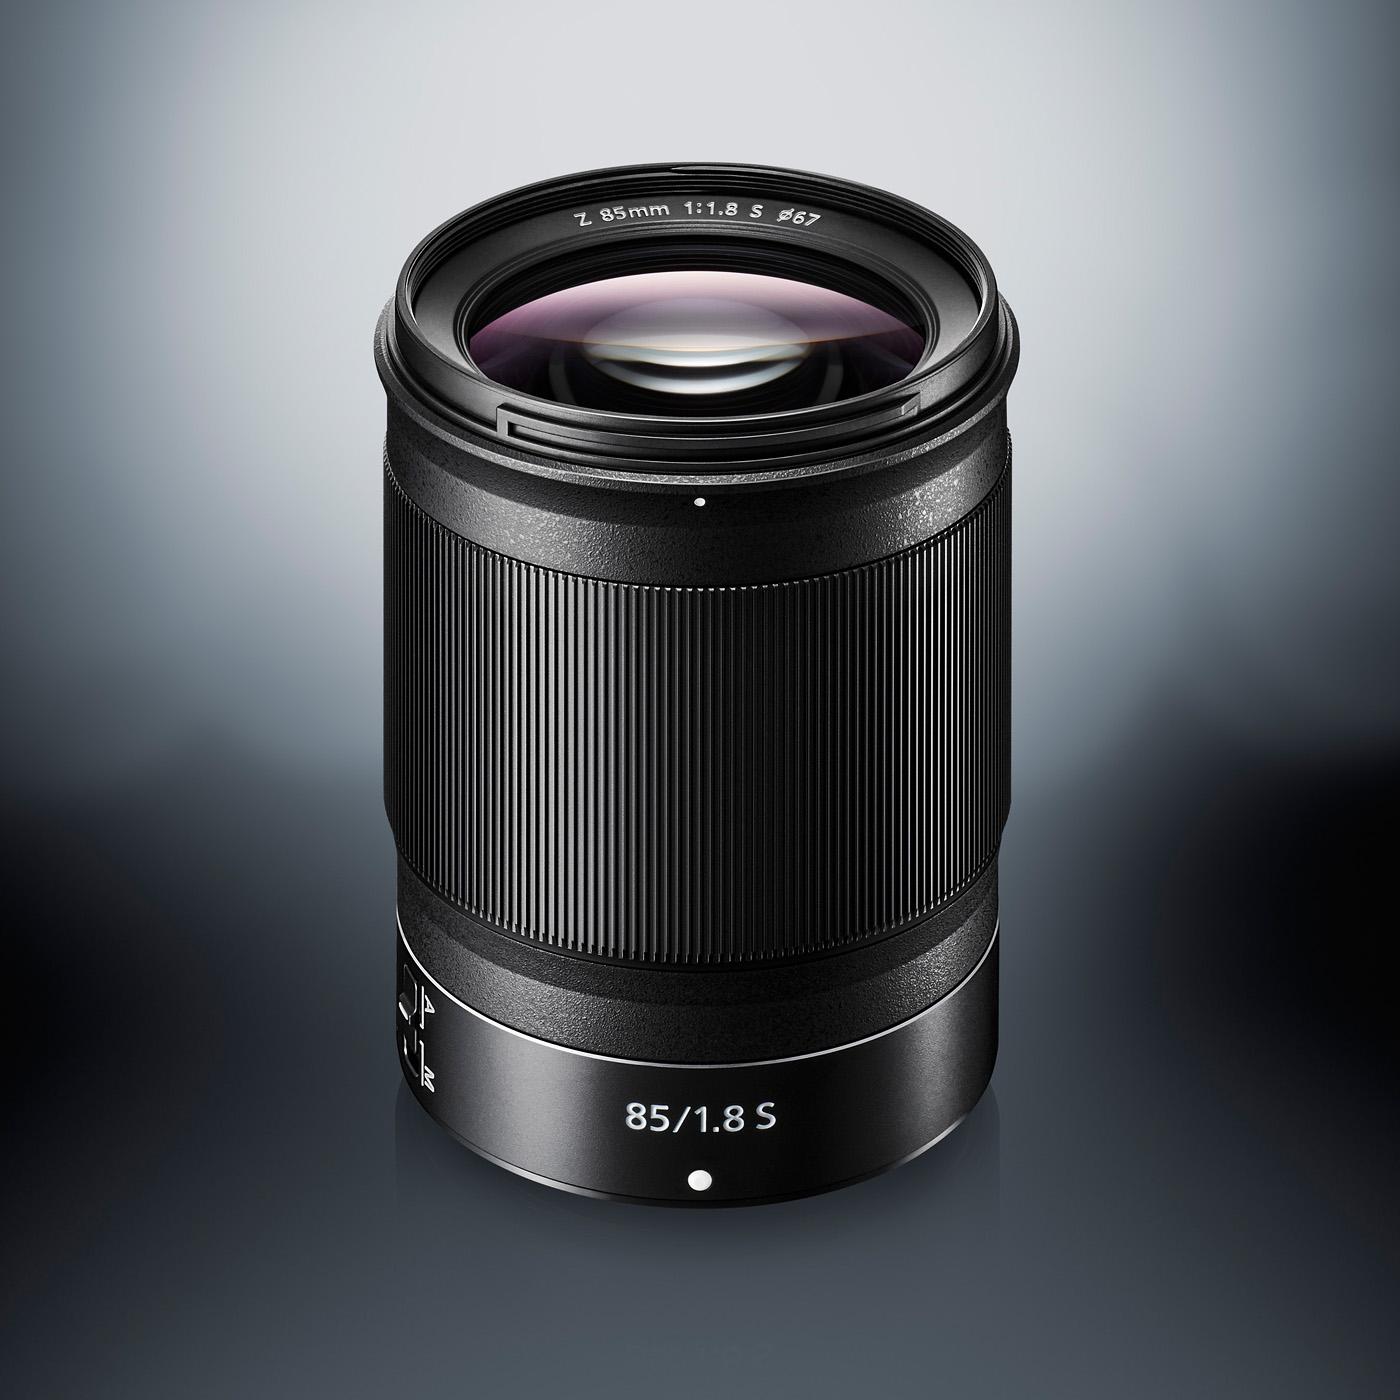 Nikkor Z 85 mm f/1,8 S